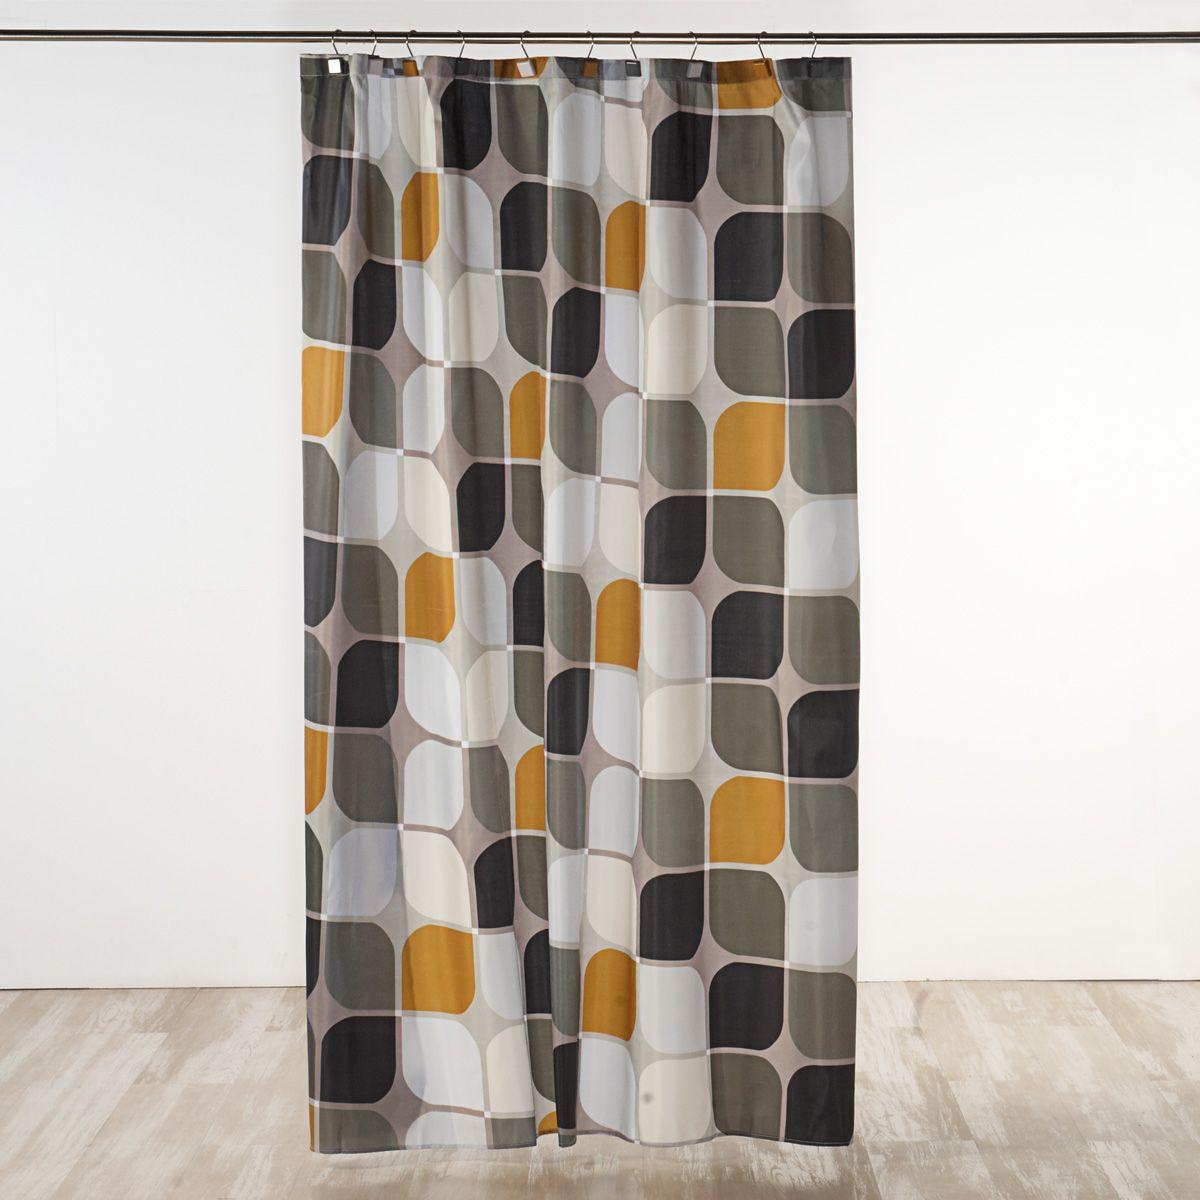 Cortinas de ba o modernas mosaico cortinas de ducha con dise o moderno de mosaico en grises y - Cortinas de bano de diseno ...